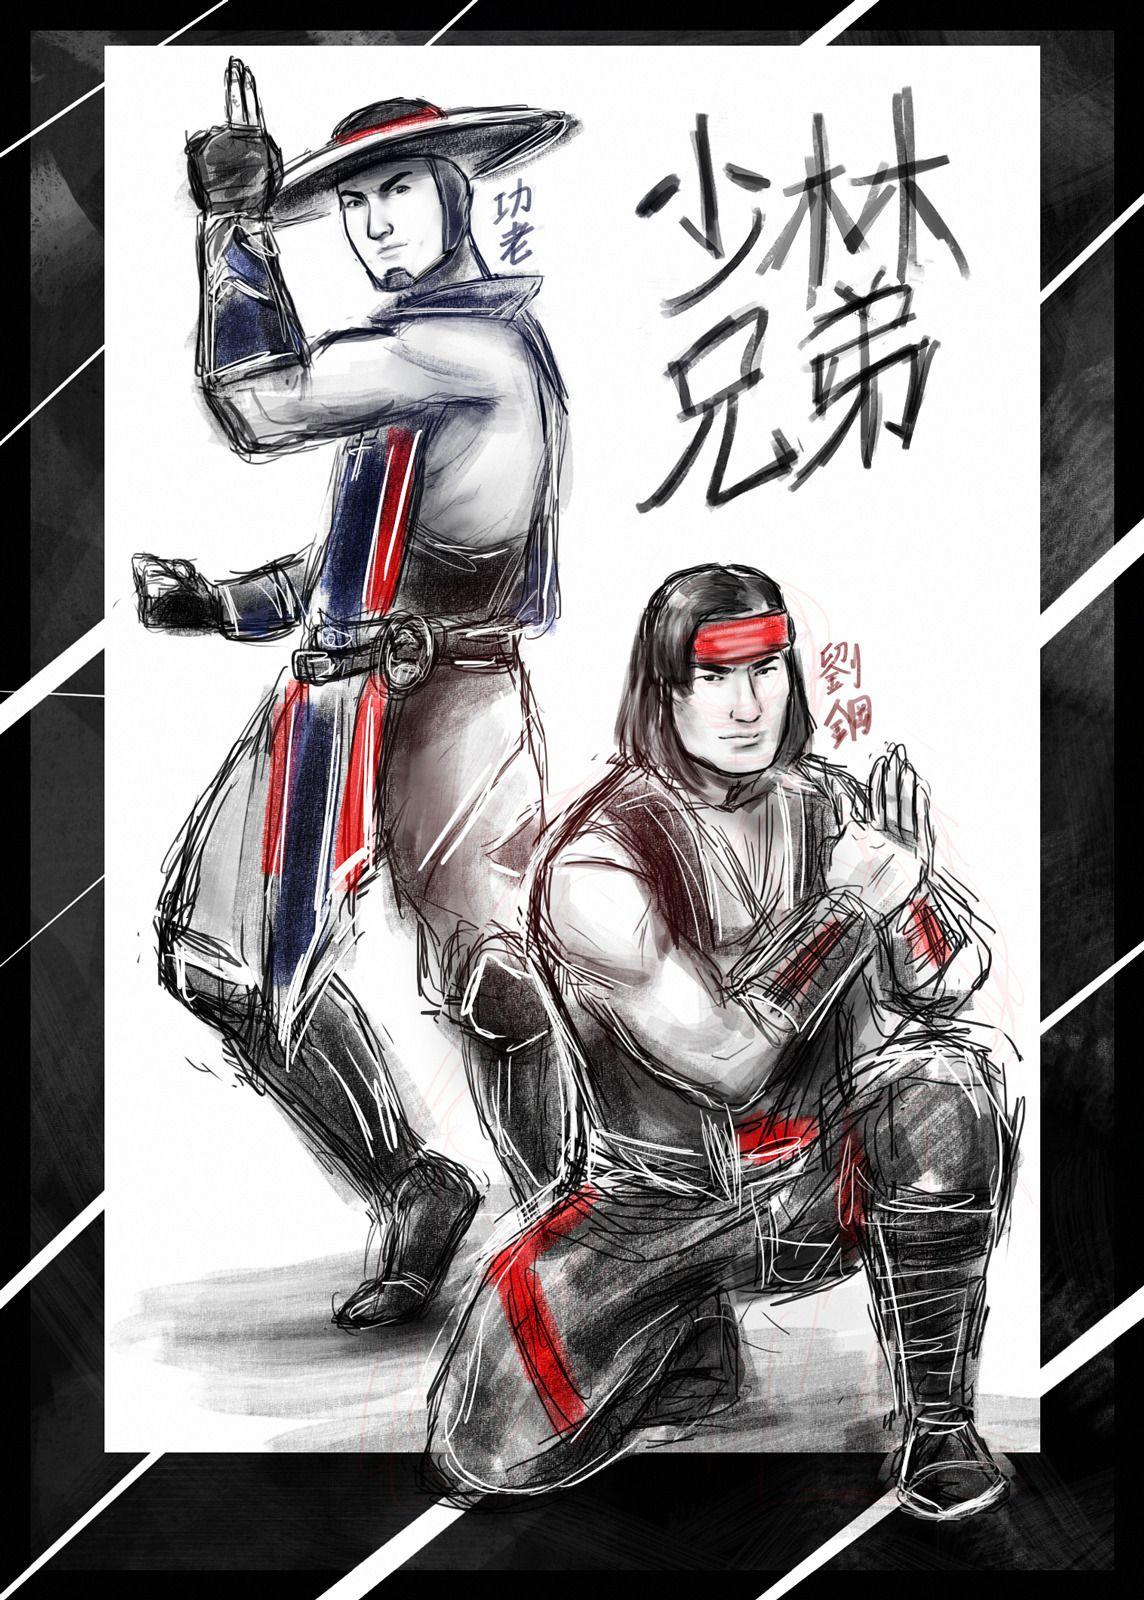 Mortal Kombat 11 Drawings | HD Wallpaper